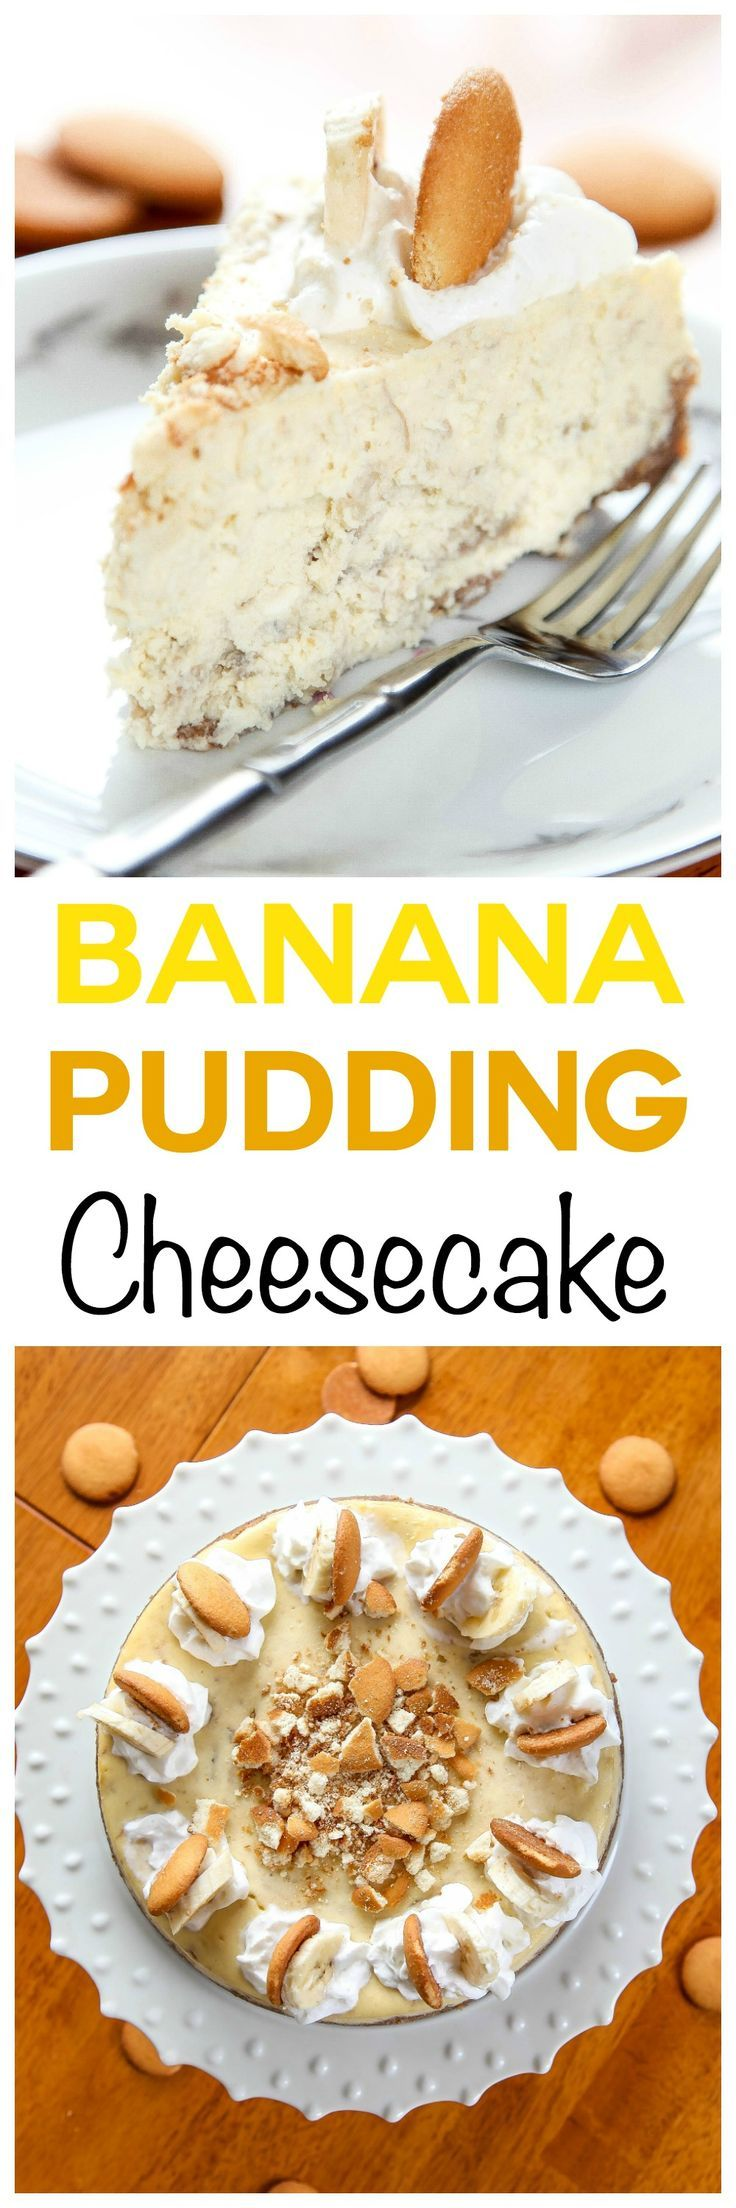 "Banana Pudding Cheesecake!!!!!!!! Oh my... YUM!!!!!!!! ""Silky smooth #banana cheesecake nestled inside a vanilla wafer crust. Tastes like banana pudding in cheesecake form!"" PLEASE!!!!"